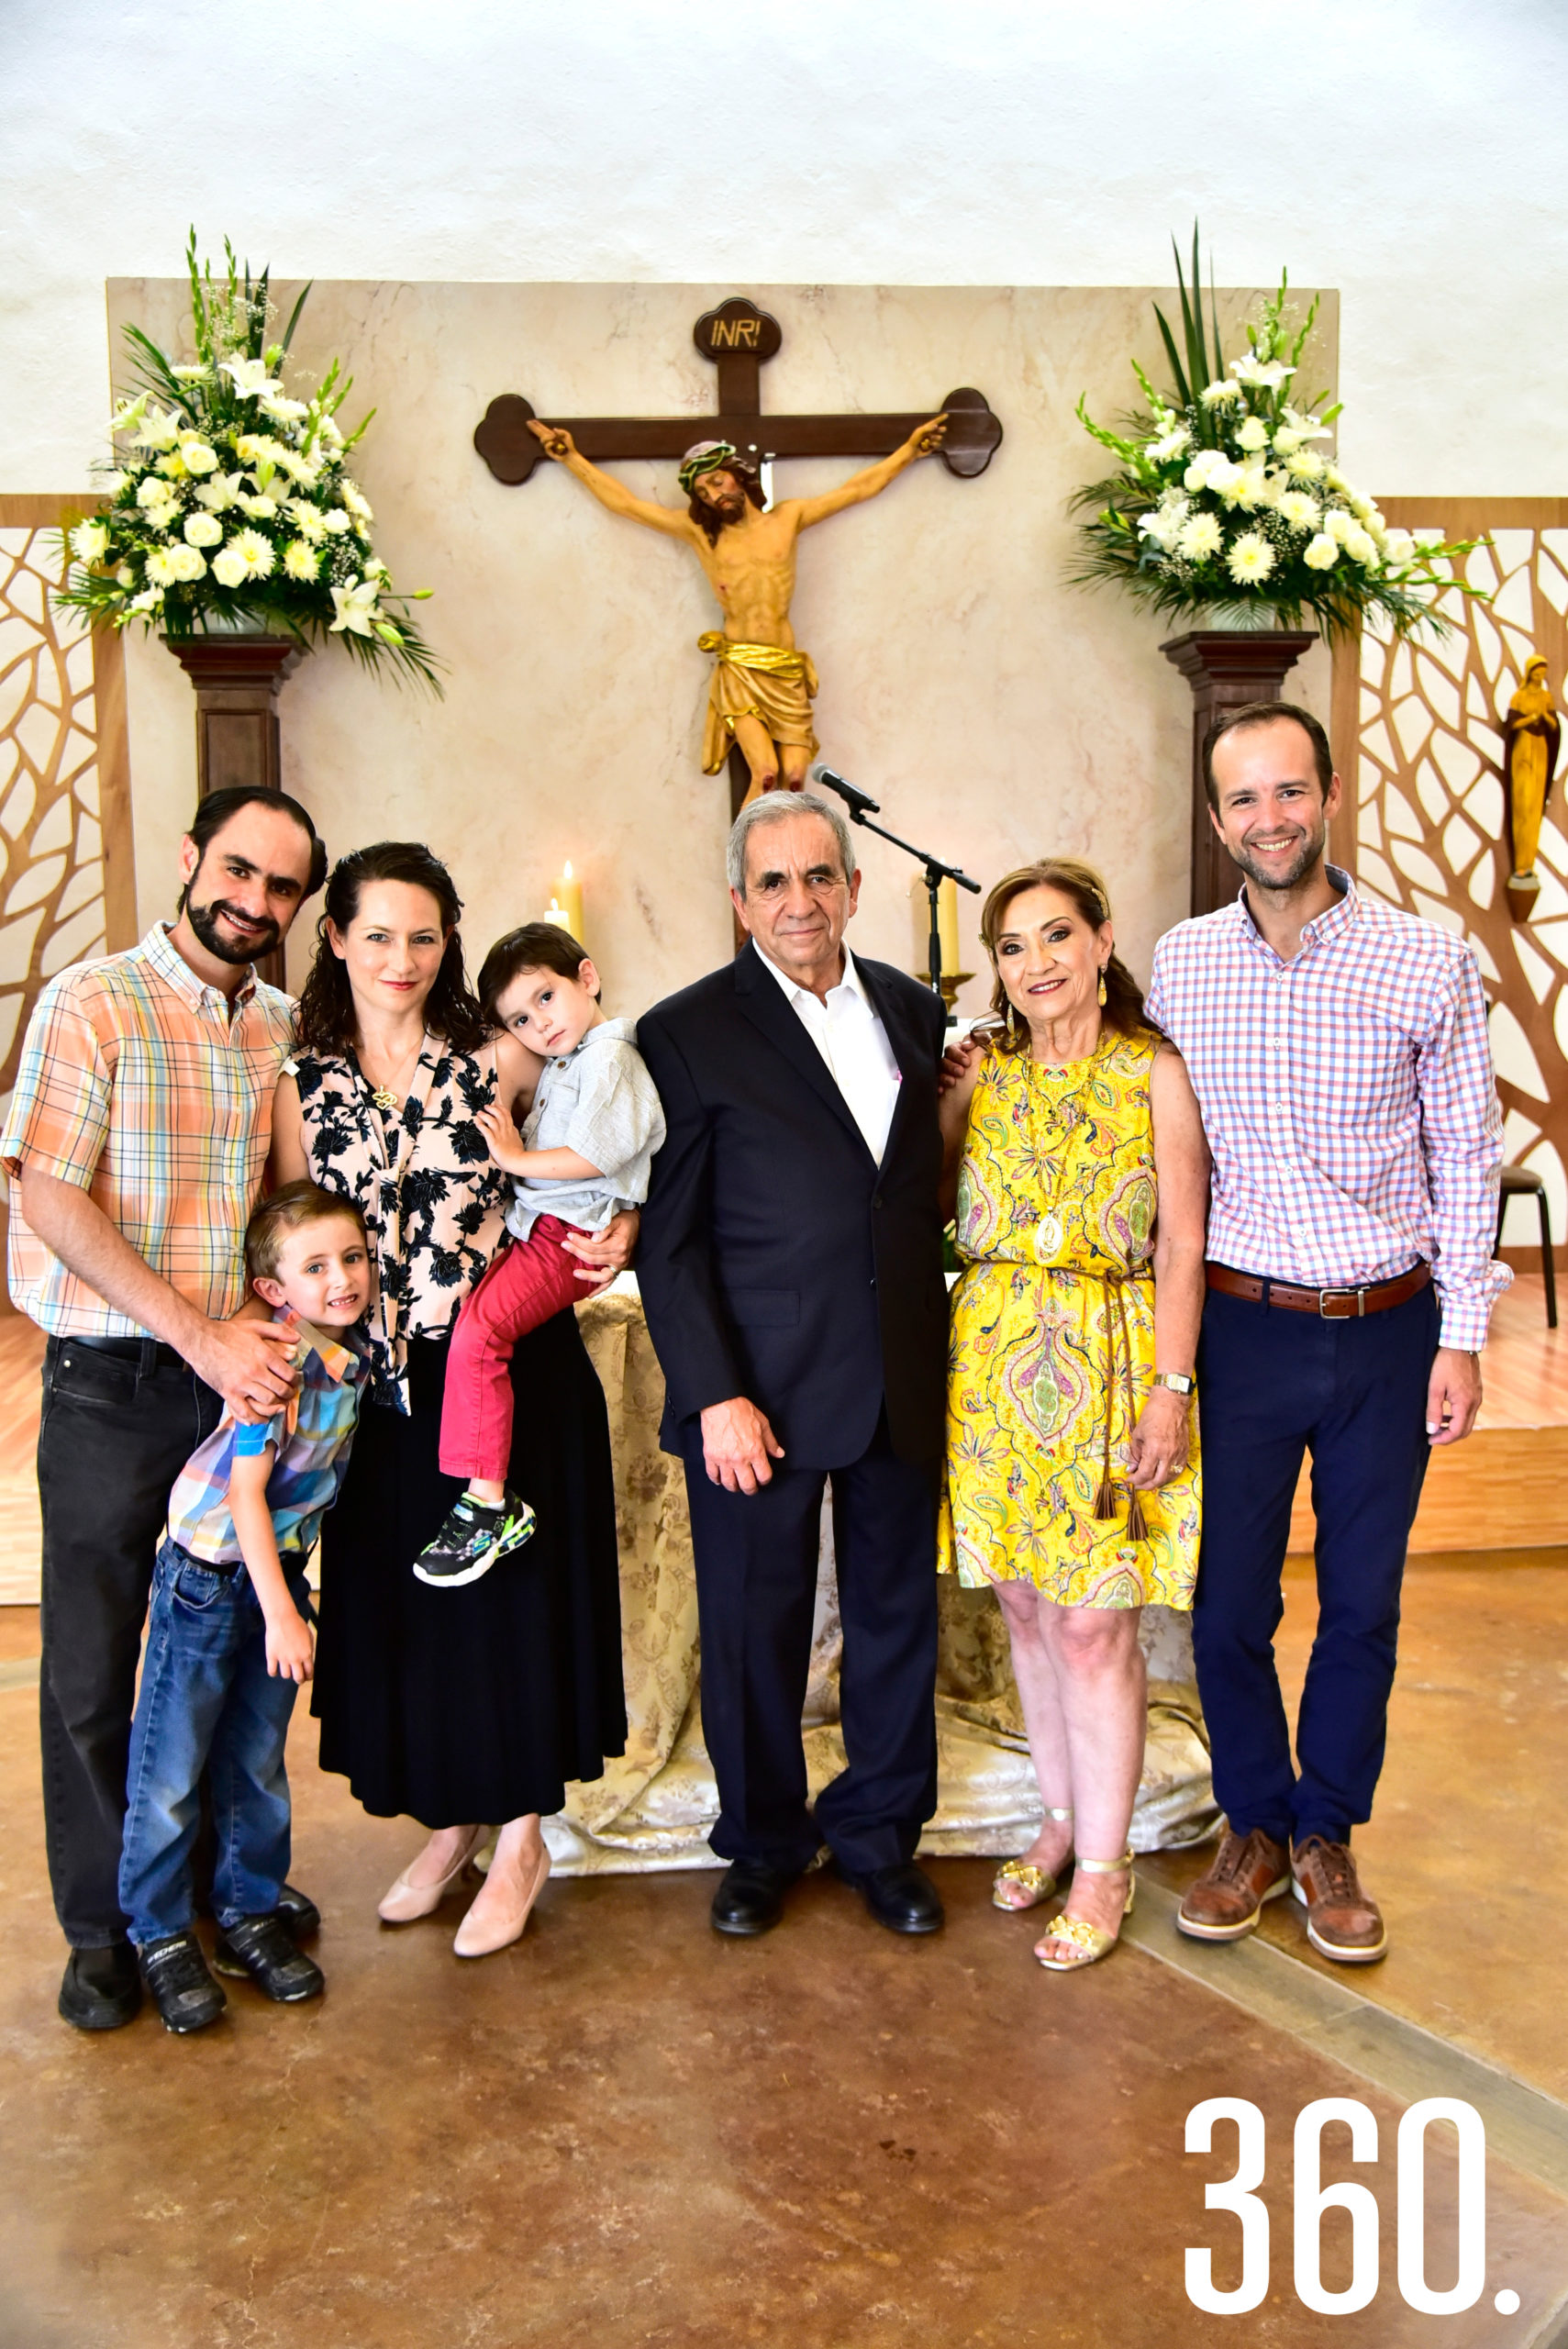 Gabriel Cruz, Gabrielito Cruz, Sofía González, Pablo Cruz, Edilberto González, Magdalena Flores y Jorge González Flores.